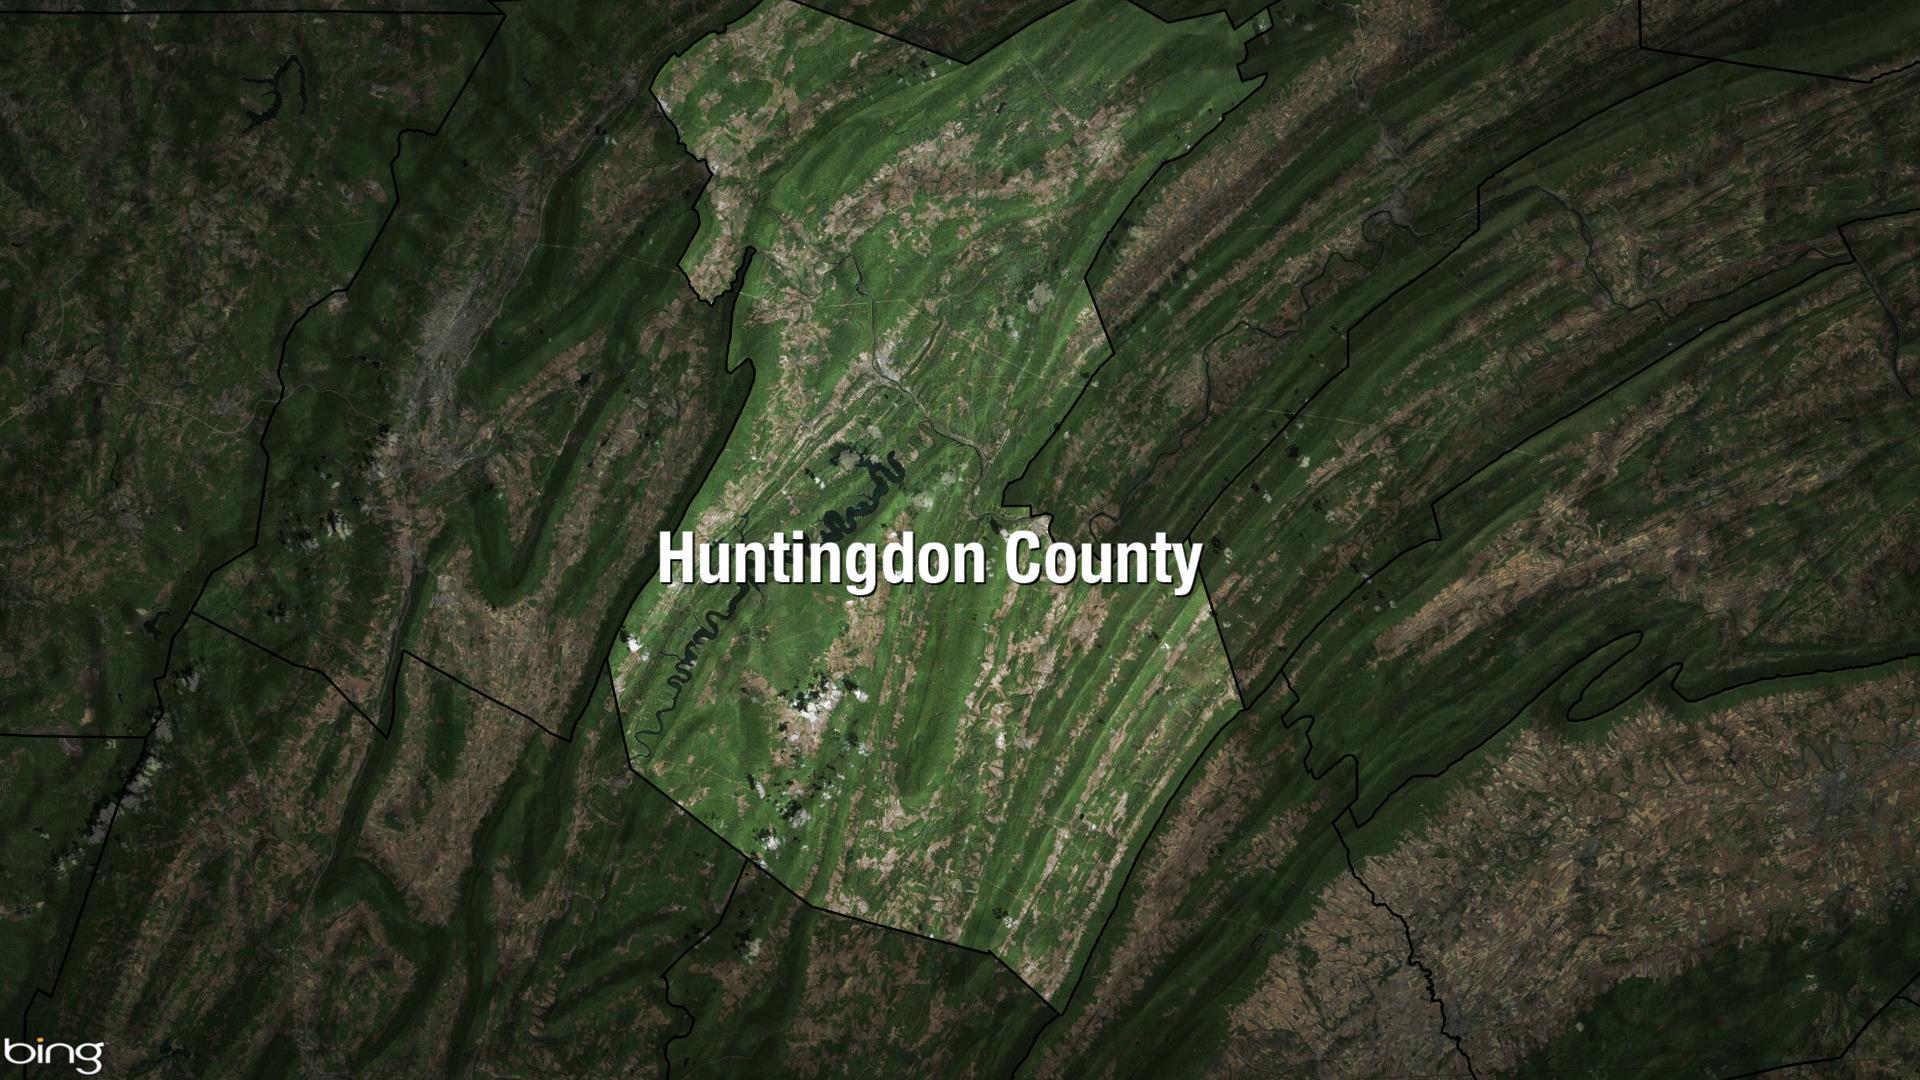 Huntingdon County Map_1517317809892.jpg.jpg